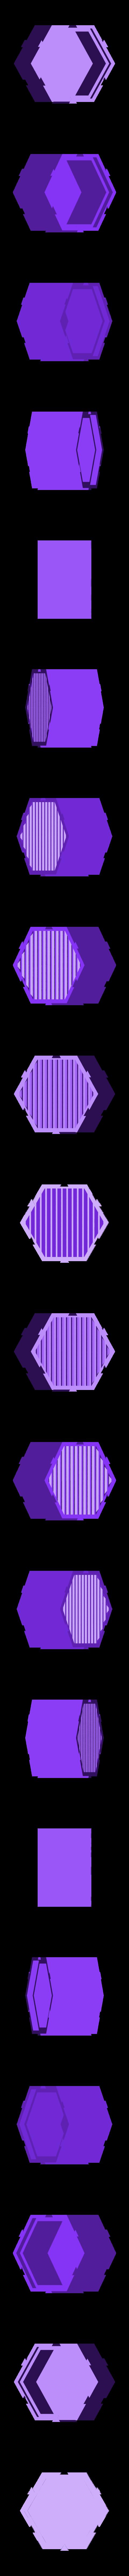 hexbox2.stl Download free STL file HexBox2 • 3D print model, Birk